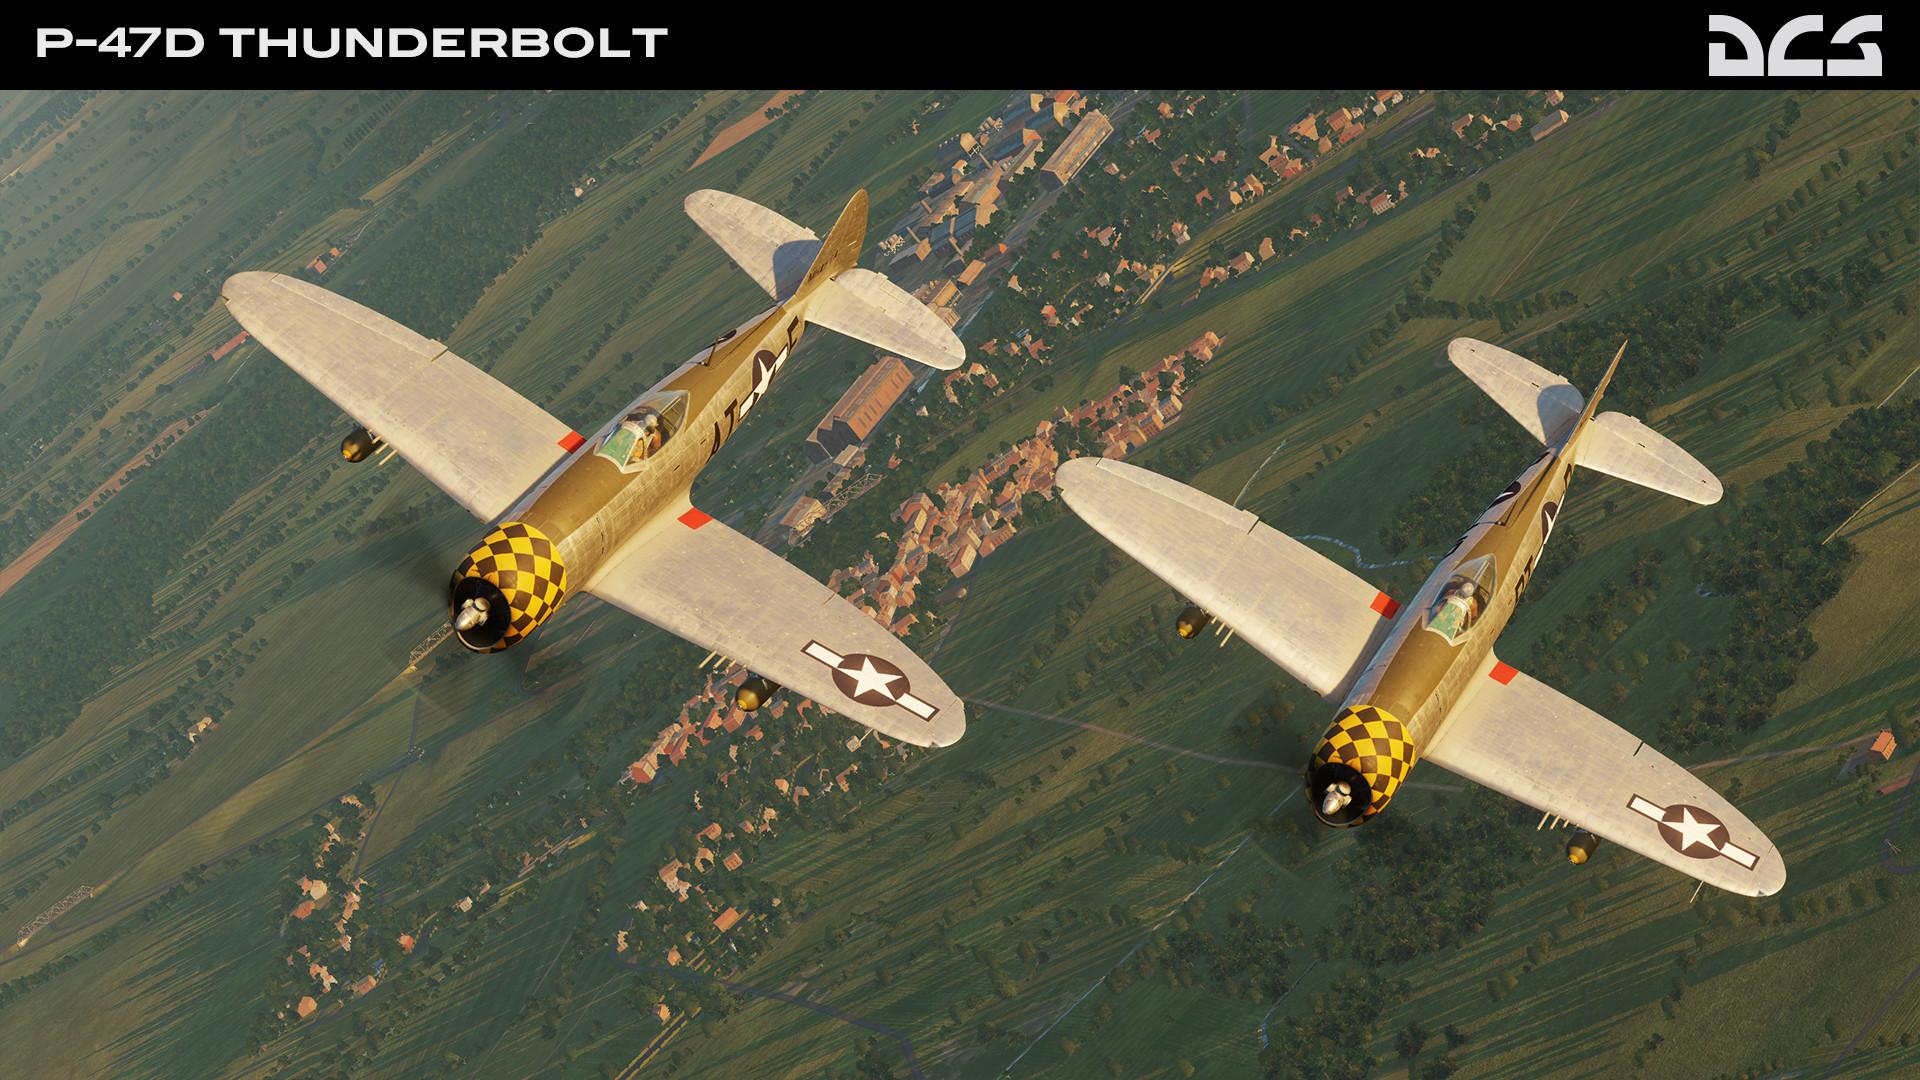 DCS: P-47D Thunderbolt